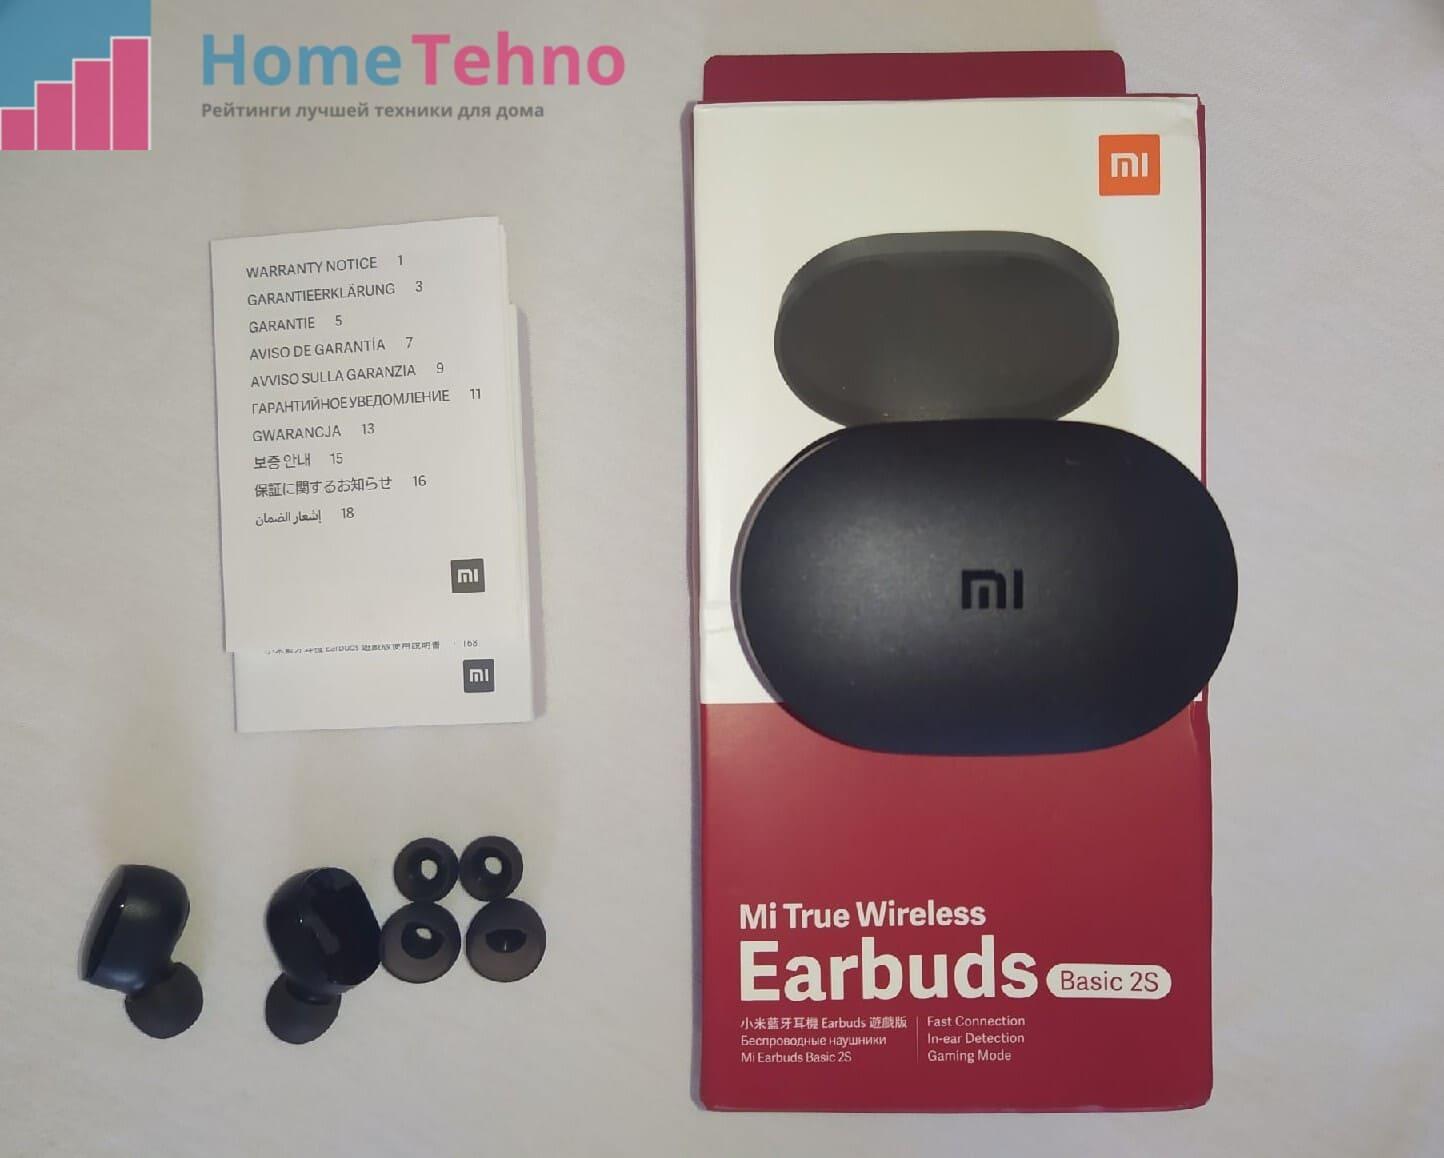 Комплект Mi True Wireless Earbuds Basic 2S